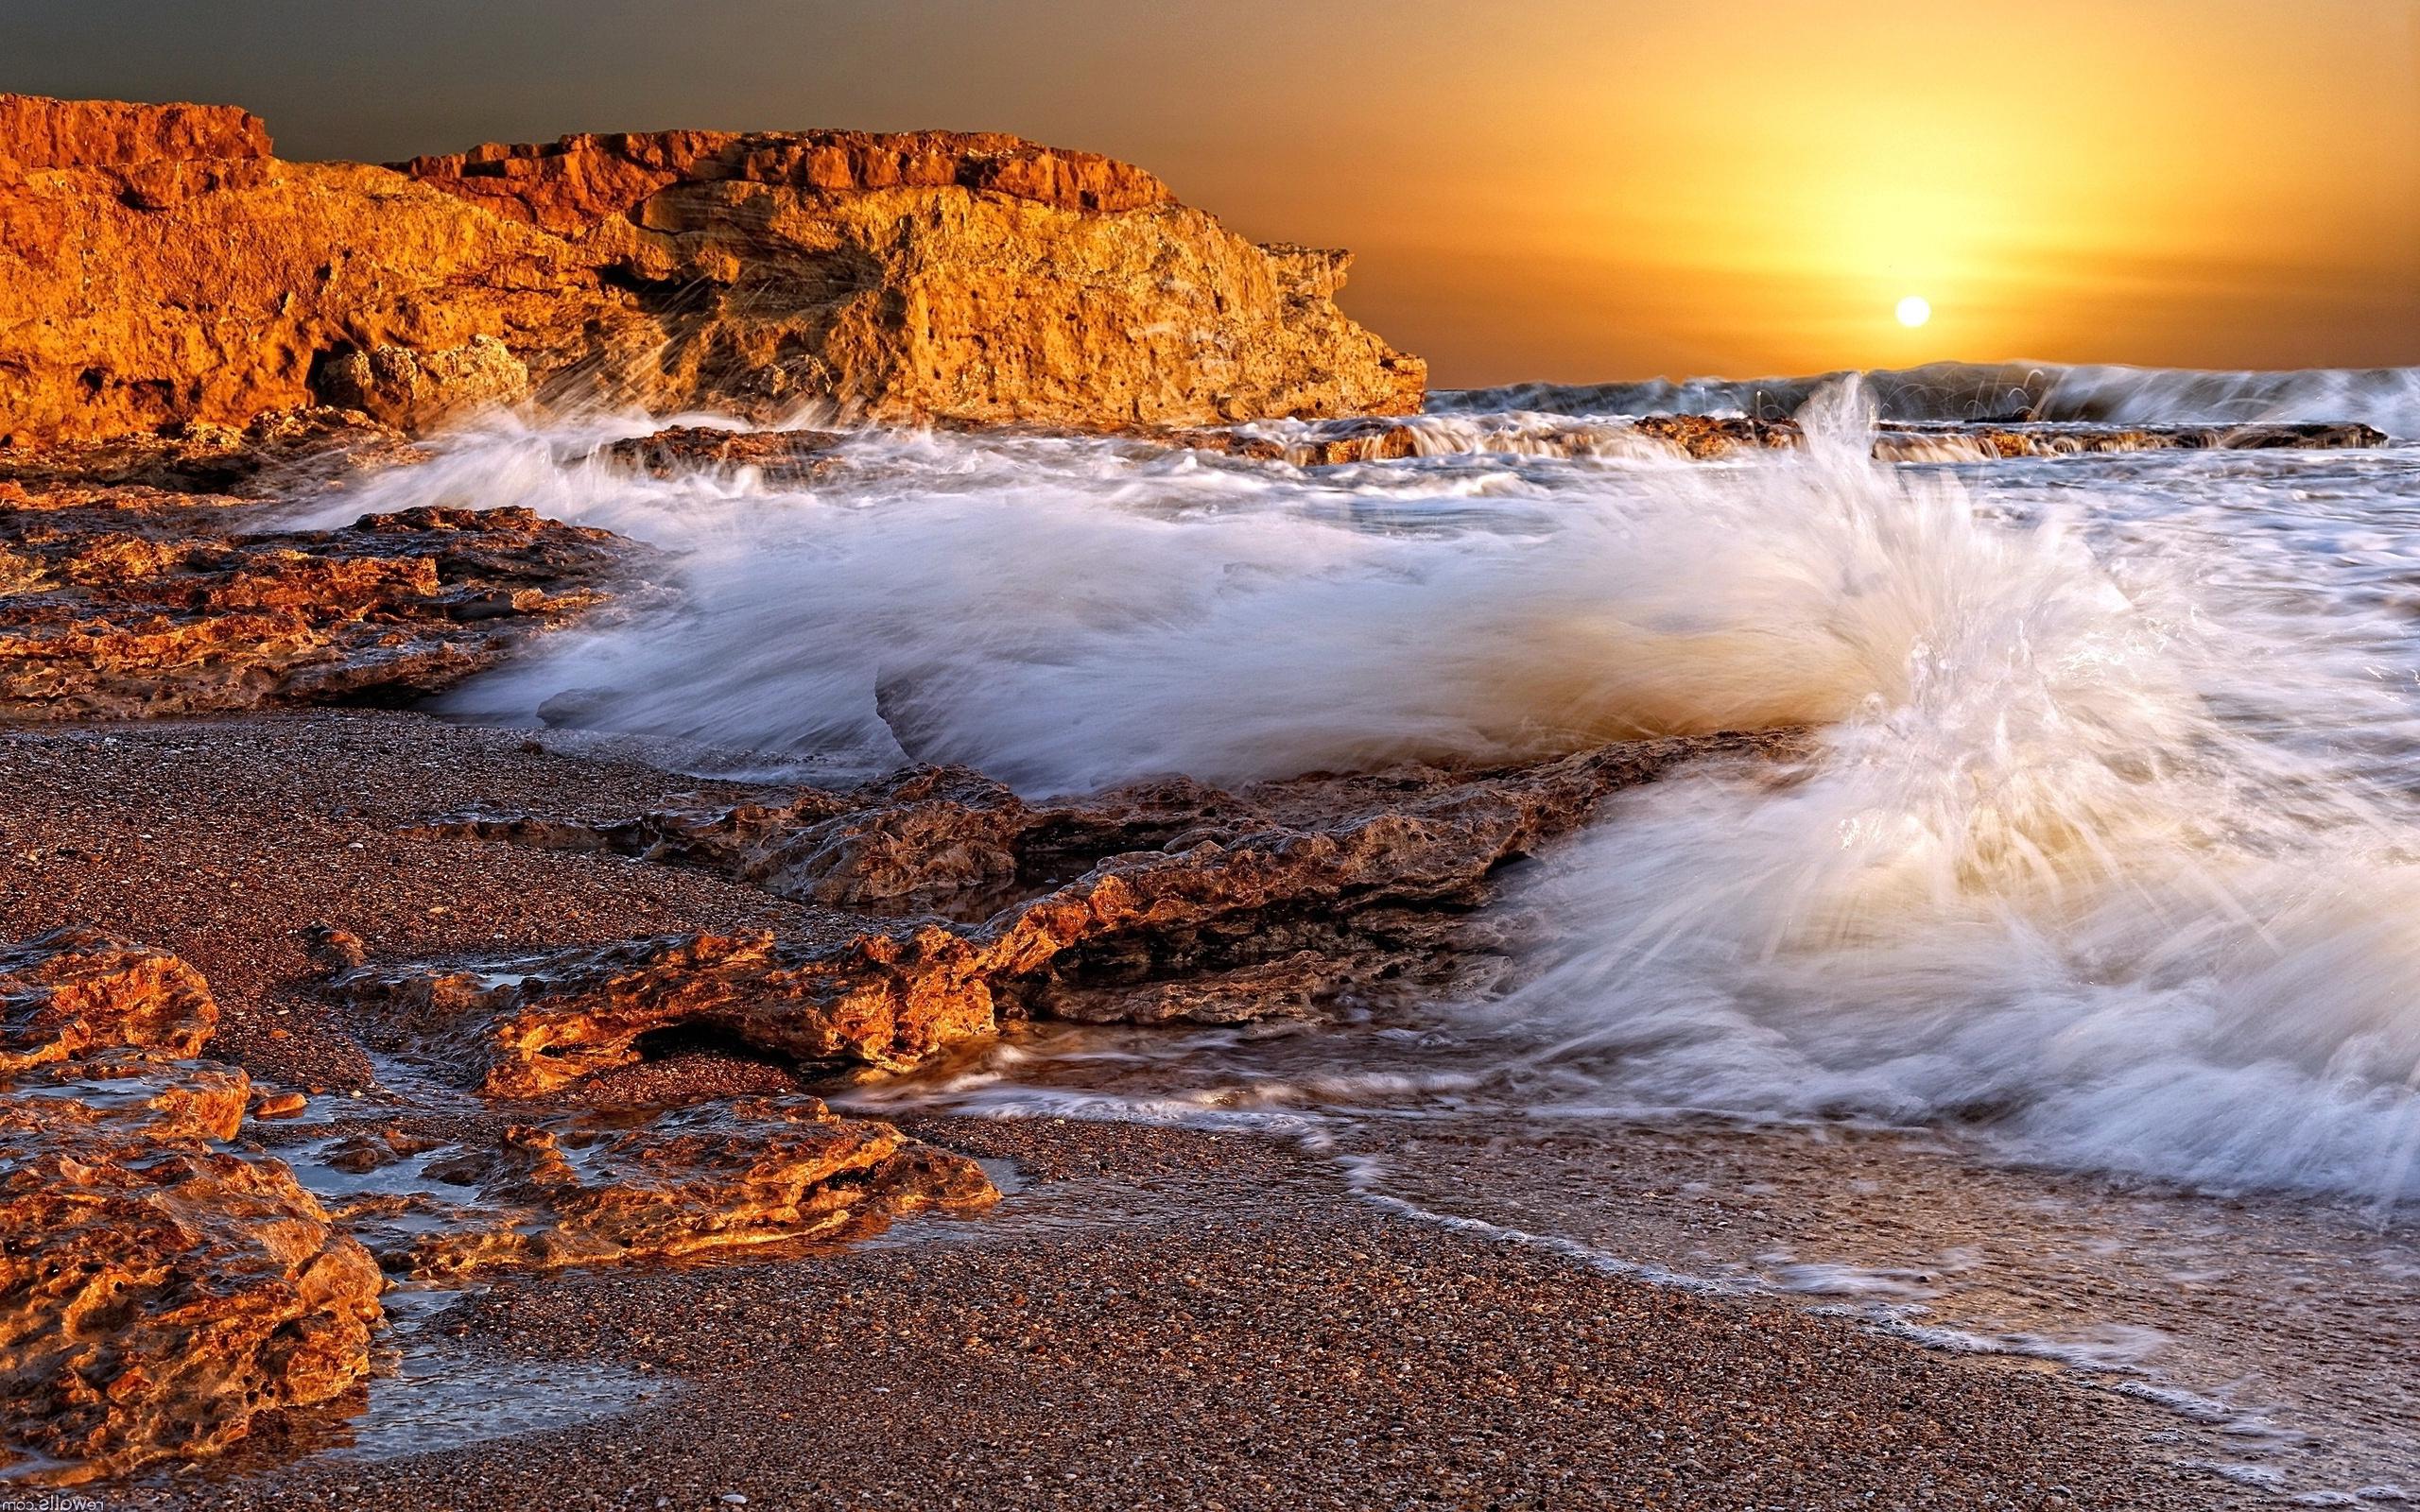 sunset wallpapers ocean waves